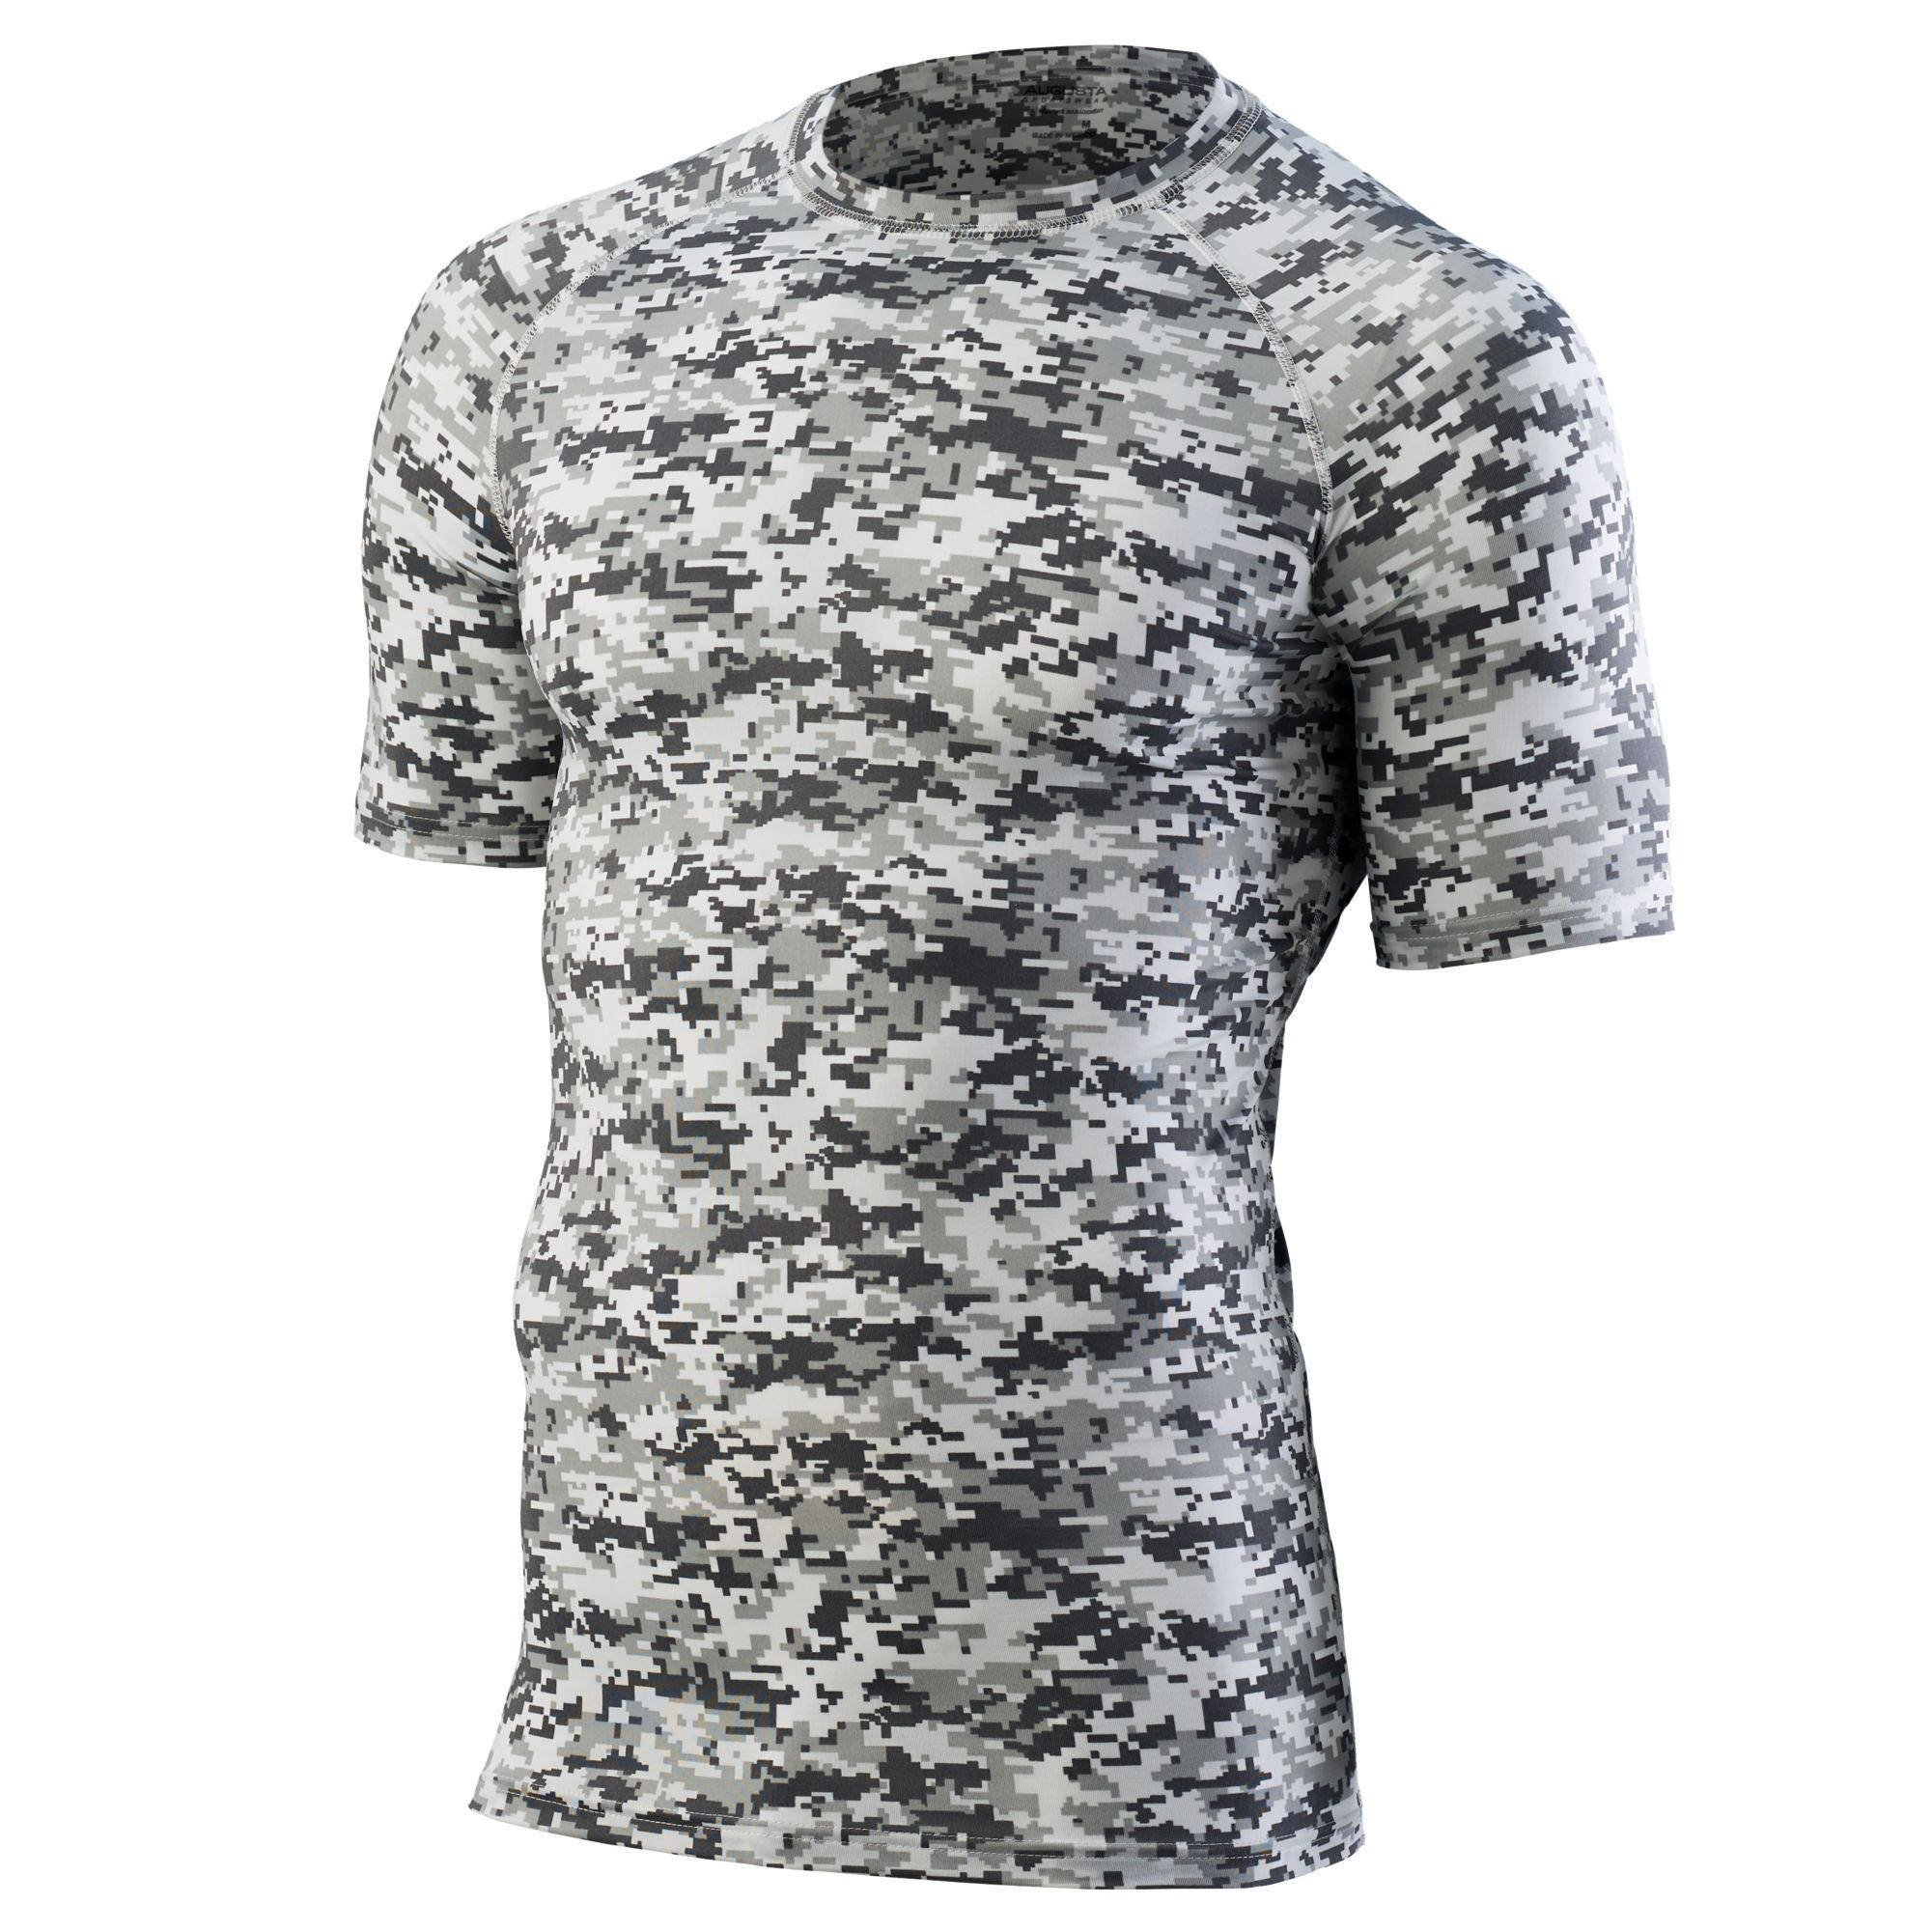 Augusta Sportswear Boys' Hyperform Compression Short Sleeve Shirt S White Digi